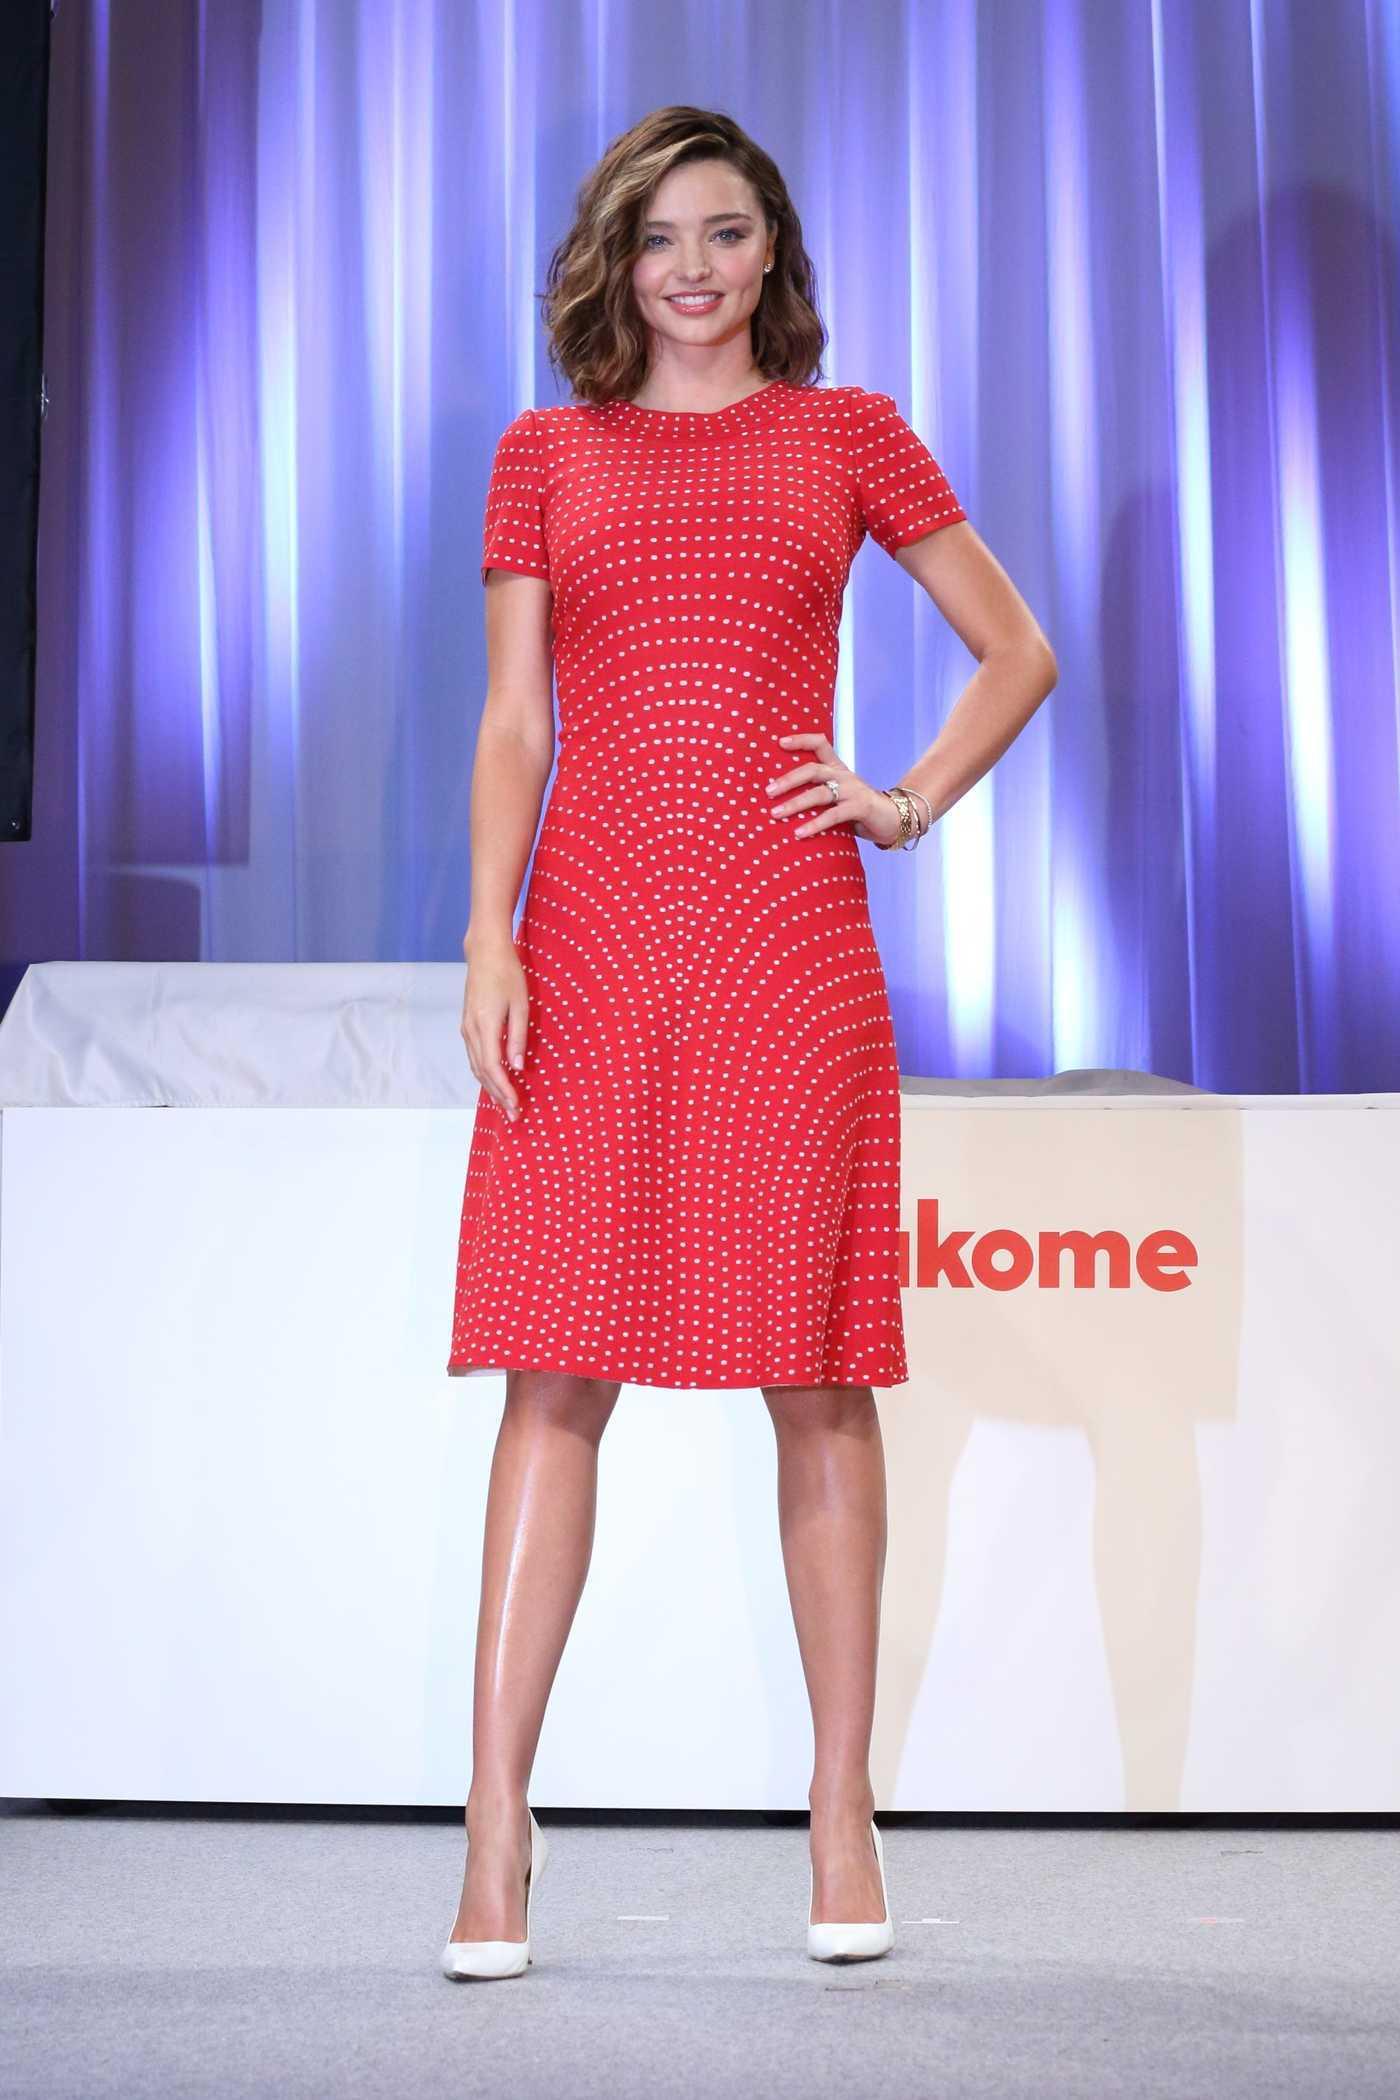 Miranda Kerr Promotes Marukome Products in Tokyo 07/10/2017